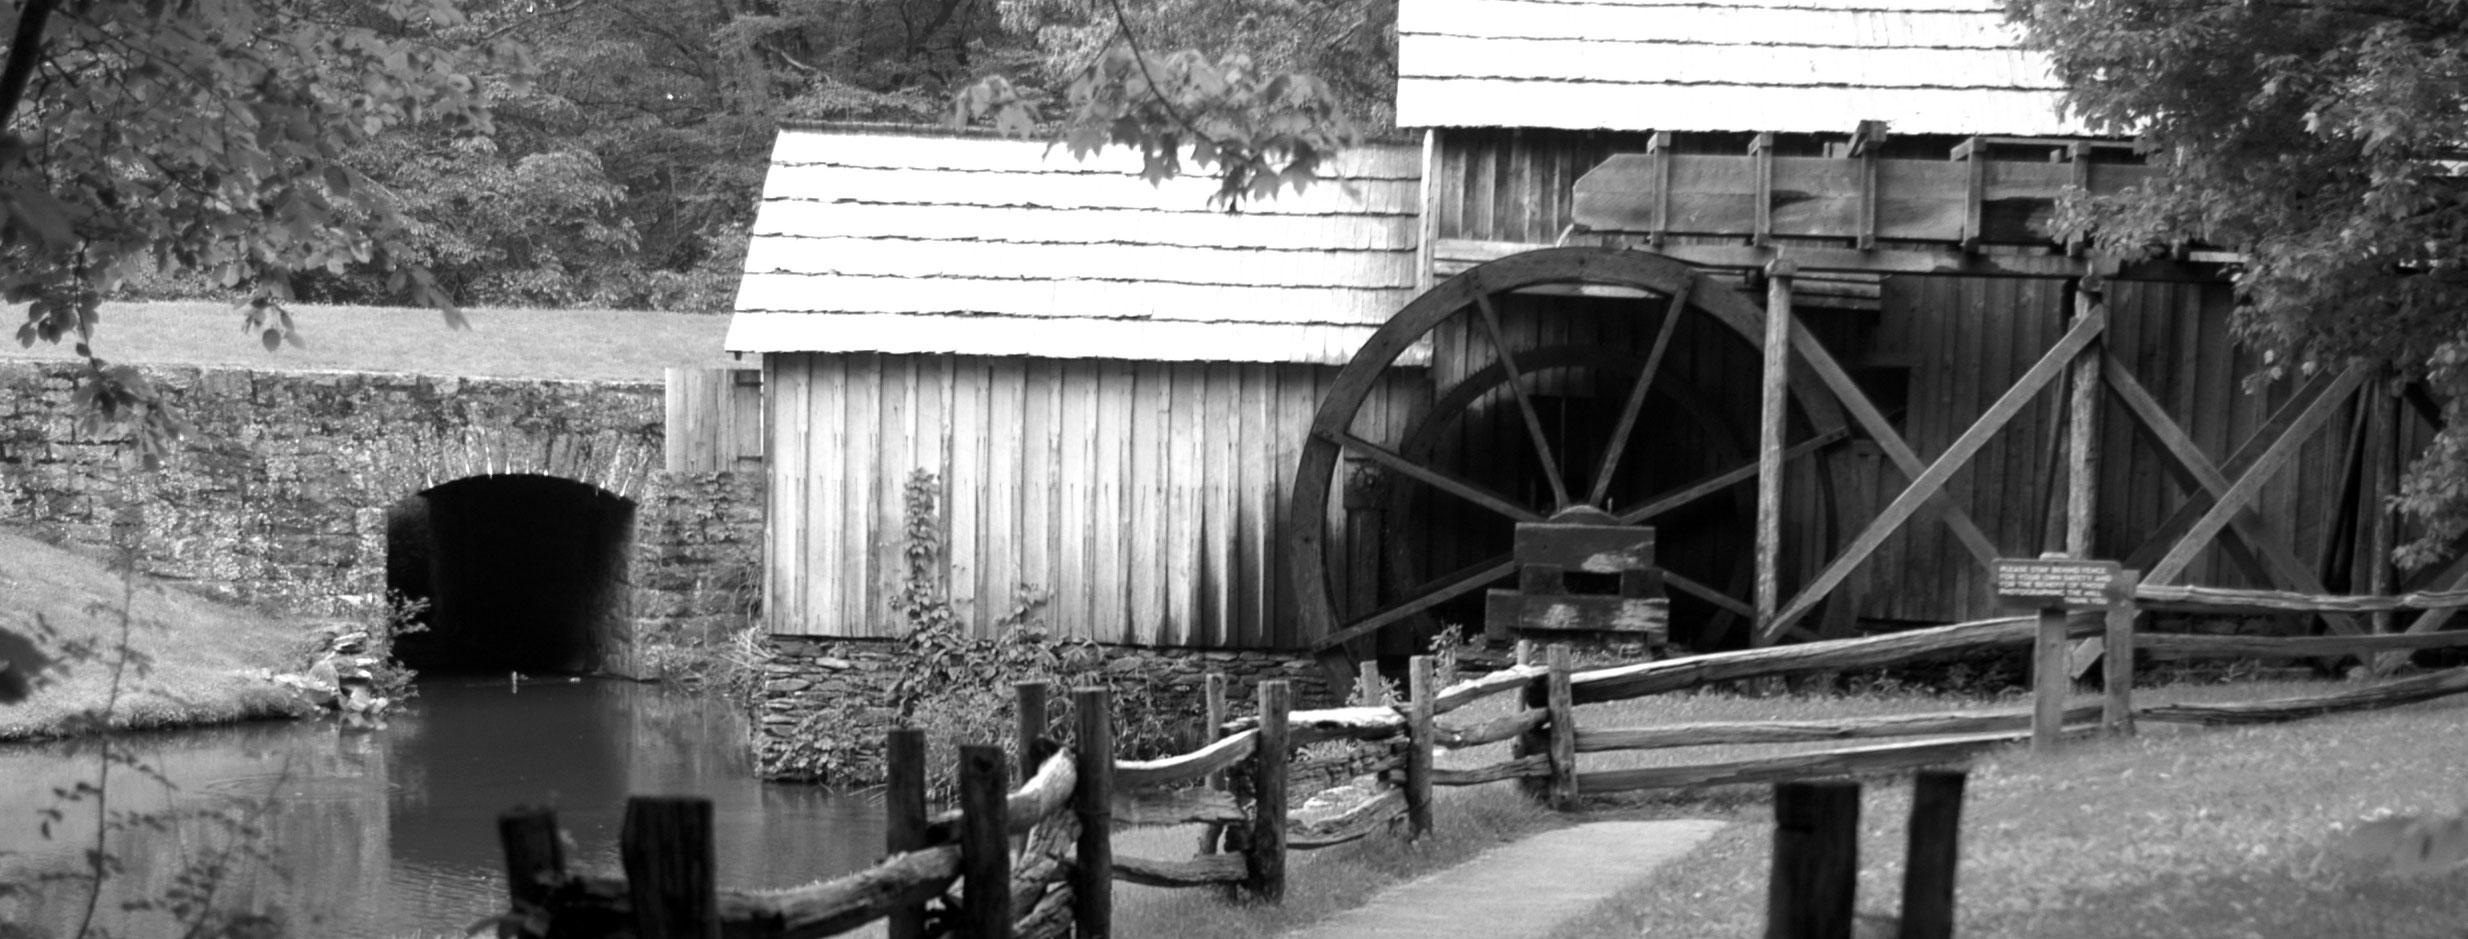 Mabry Mill restoration